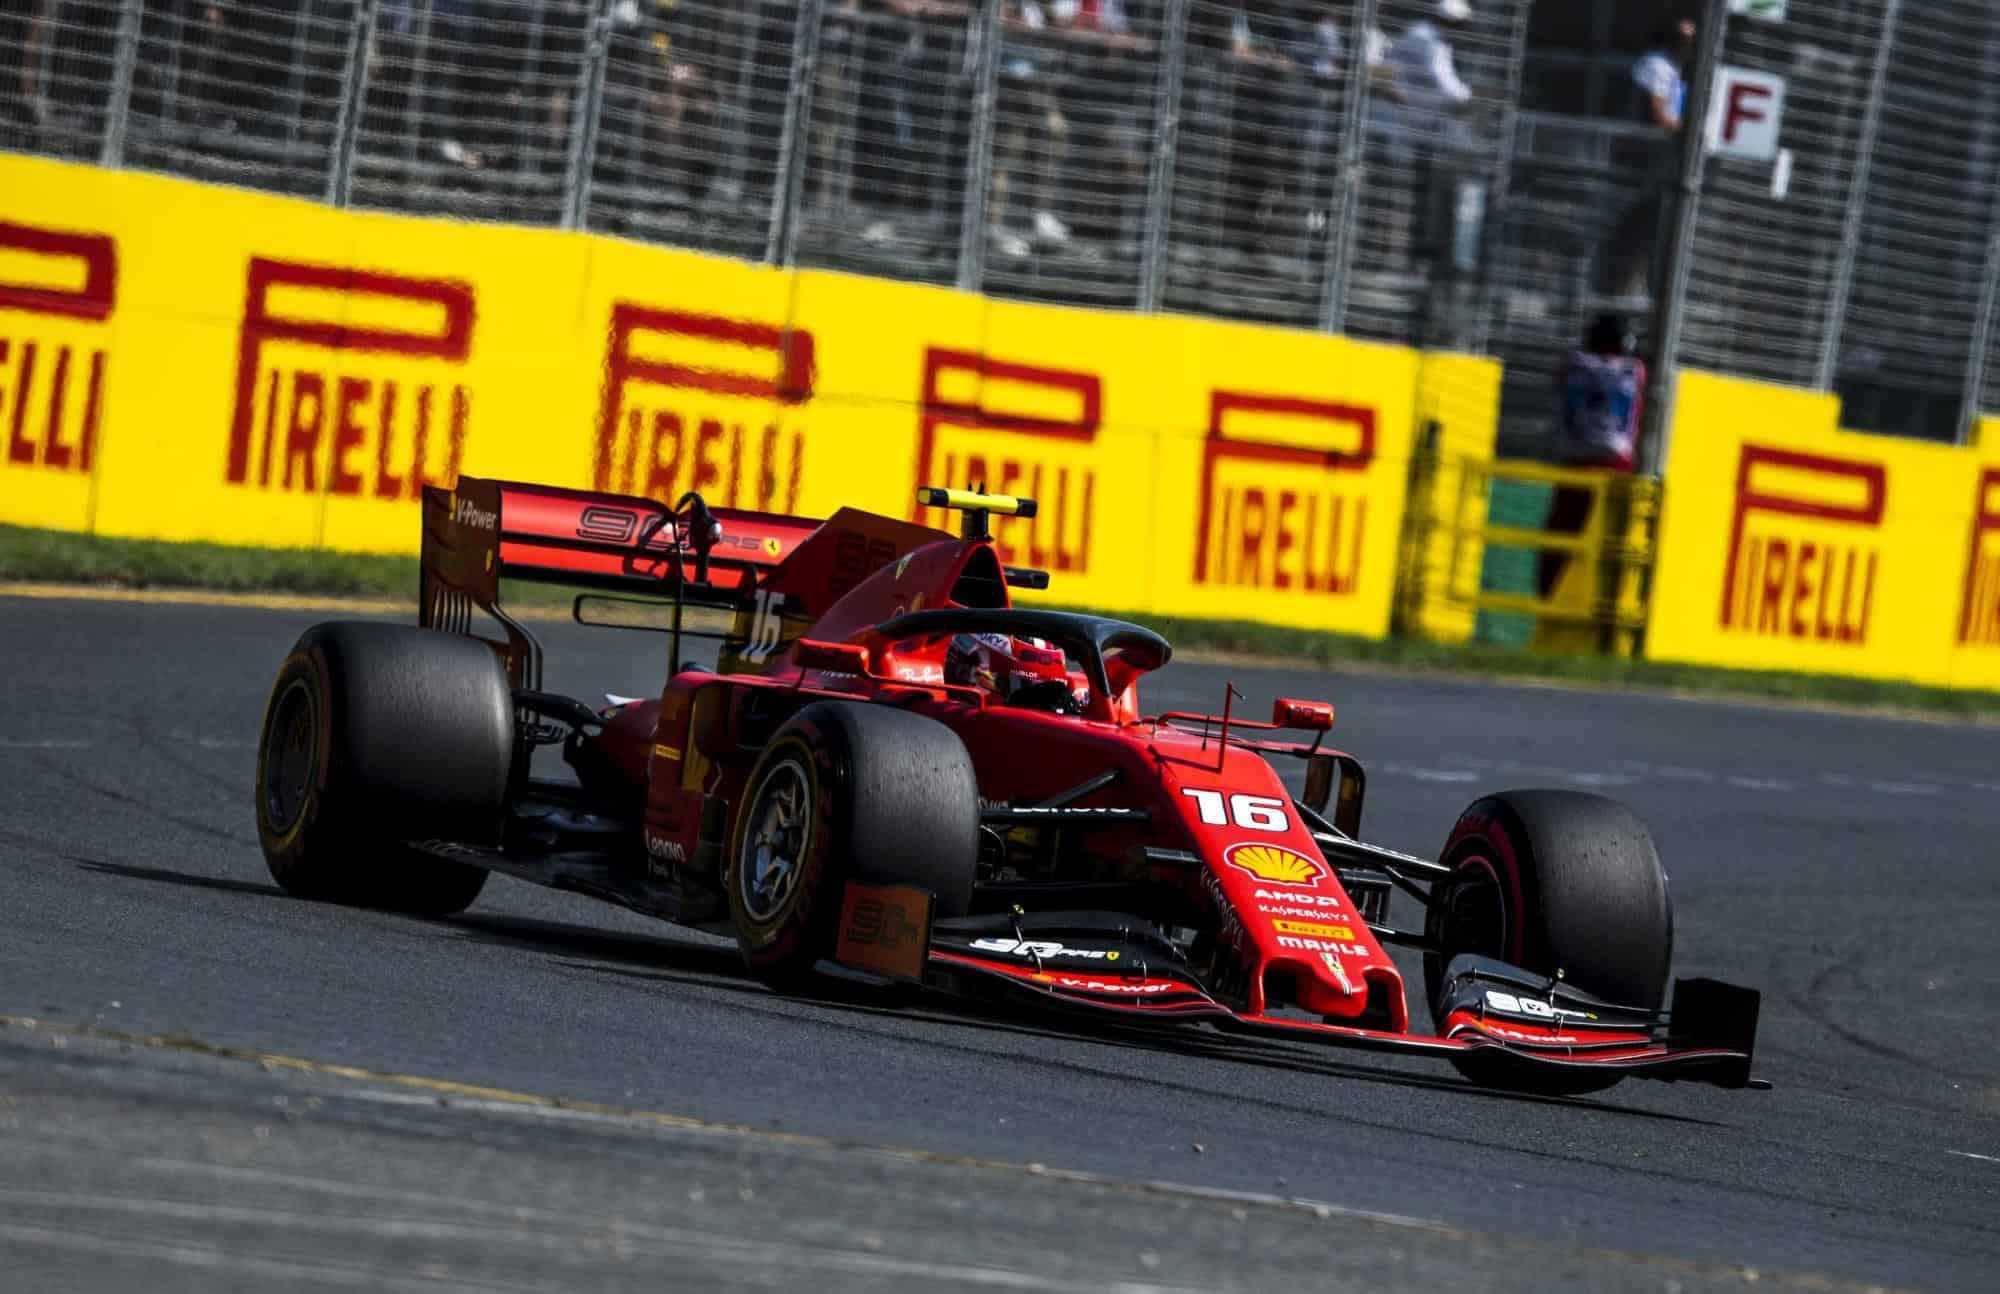 Charles Leclerc Australian GP F1 2019 Photo Ferrari Edited by MAXF1net